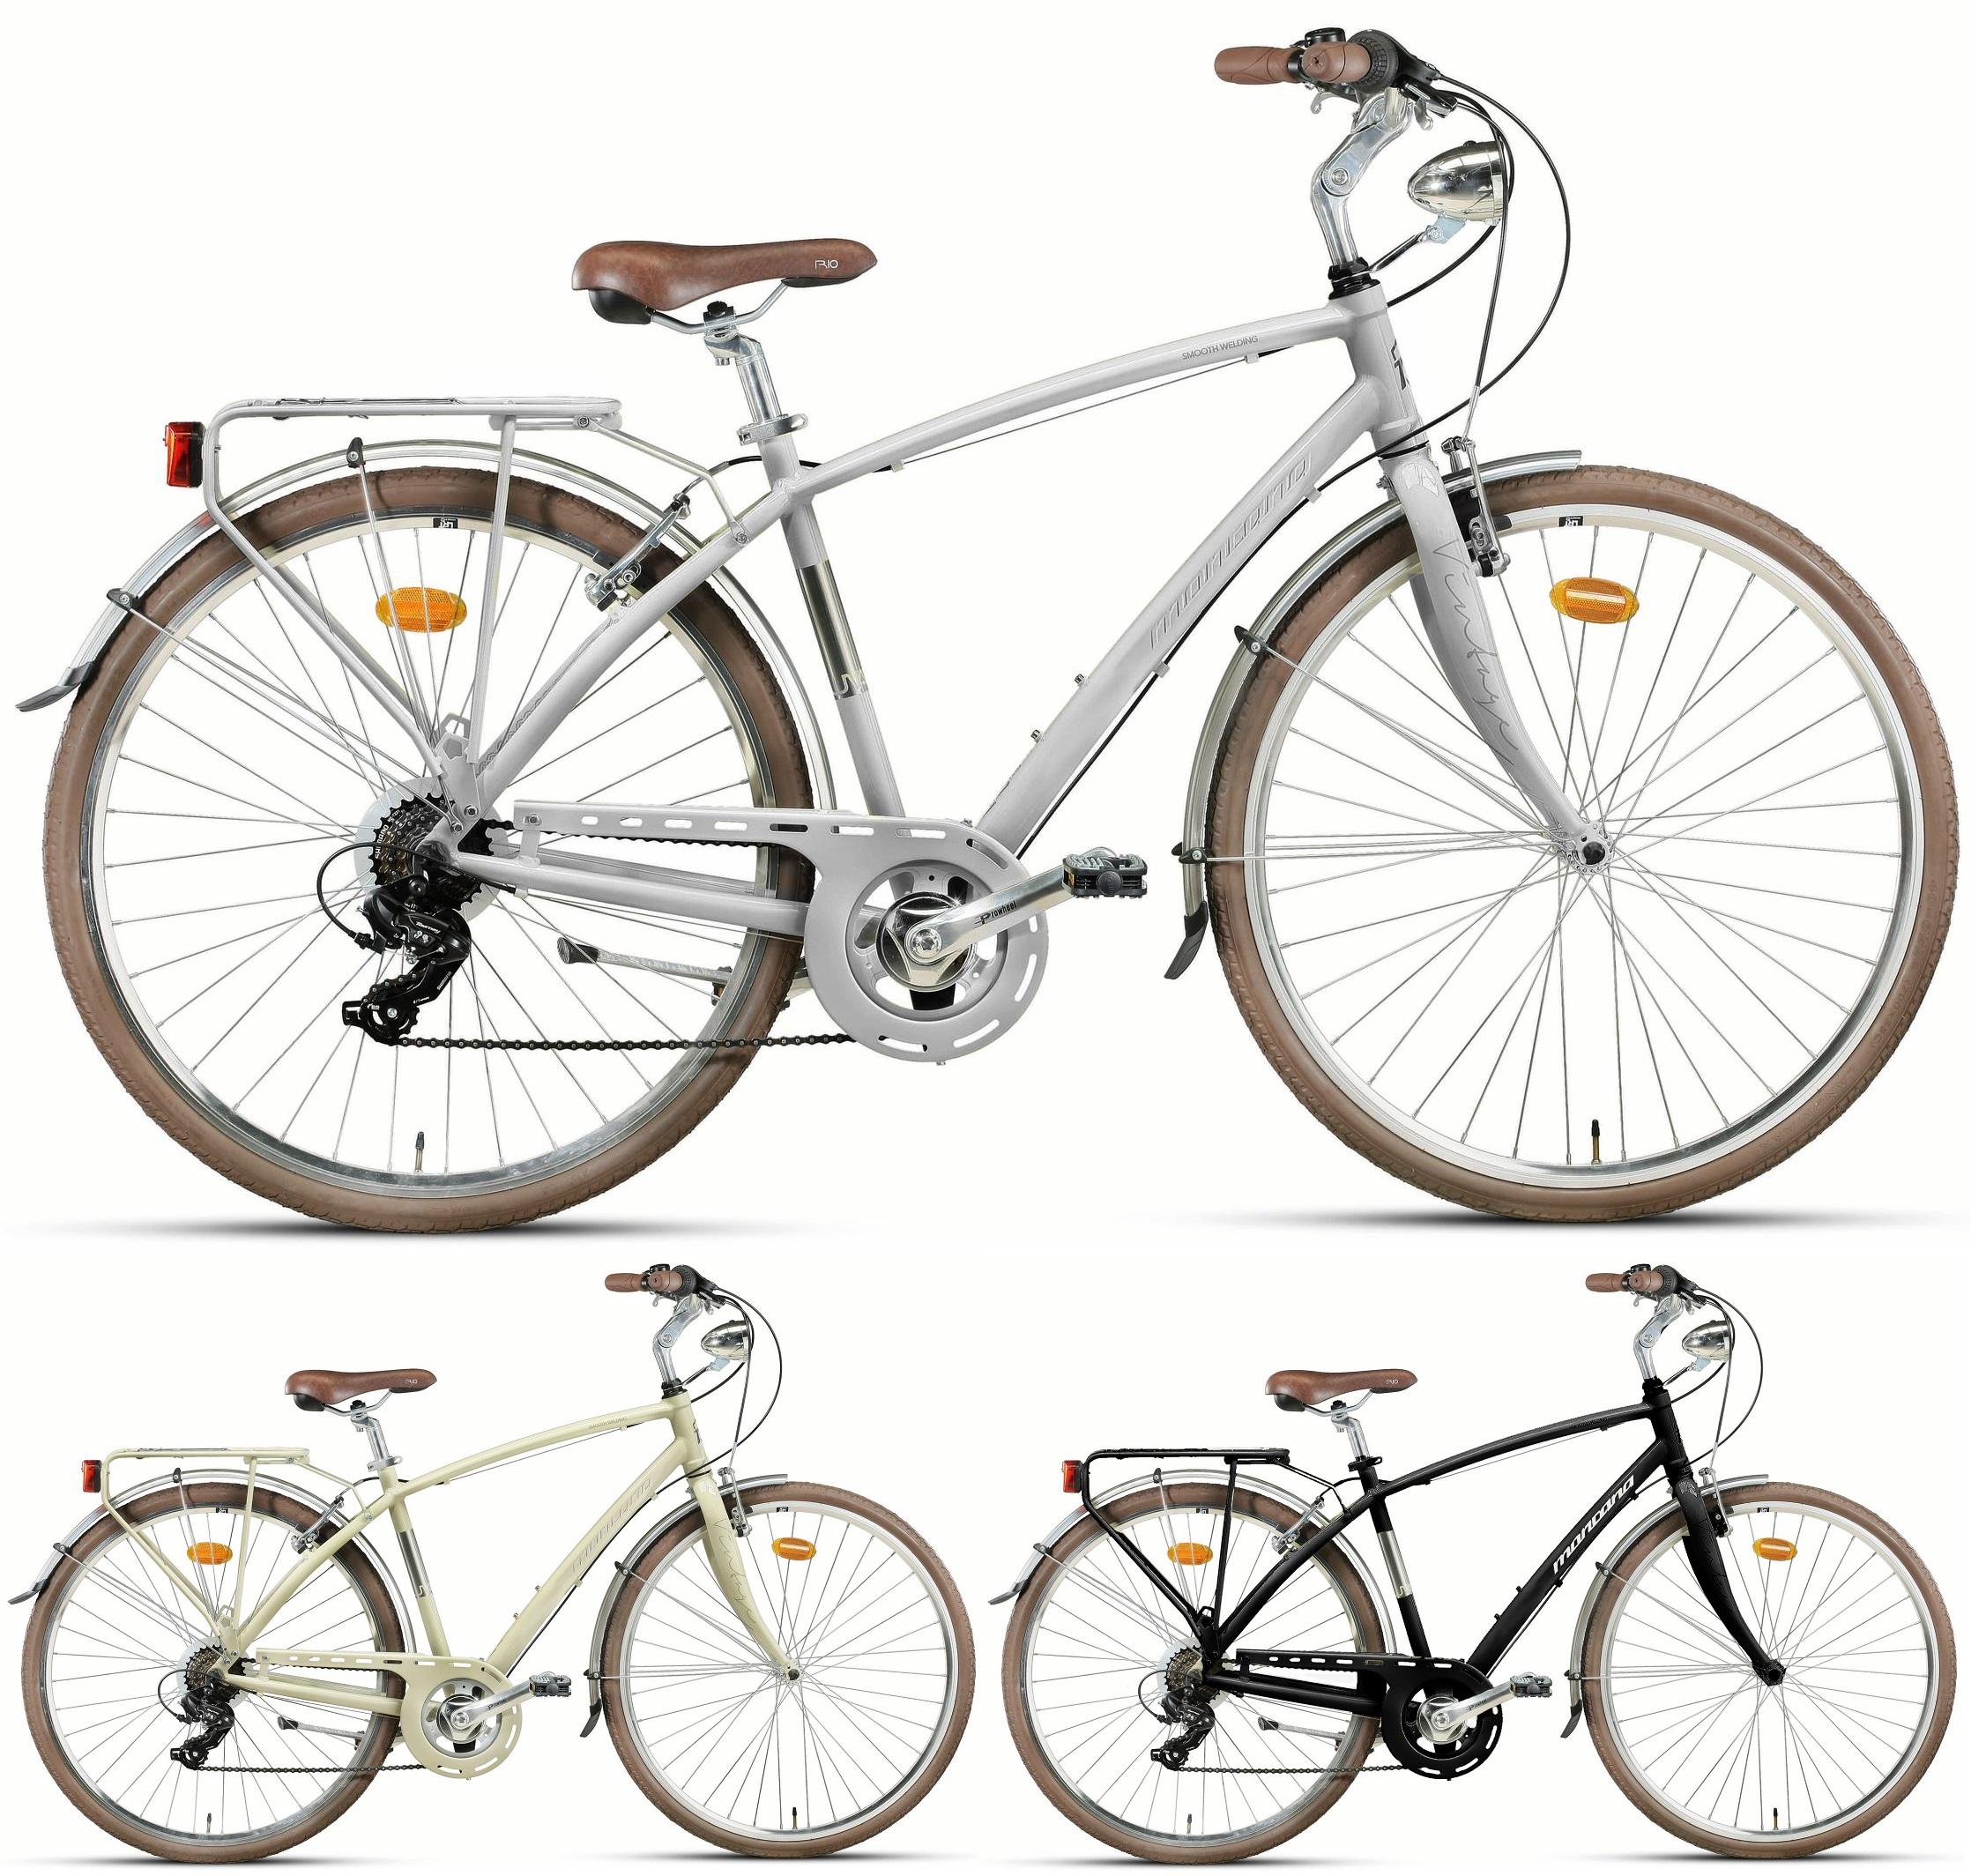 28 zoll herren city fahrrad montana lunapiena 7 gang. Black Bedroom Furniture Sets. Home Design Ideas